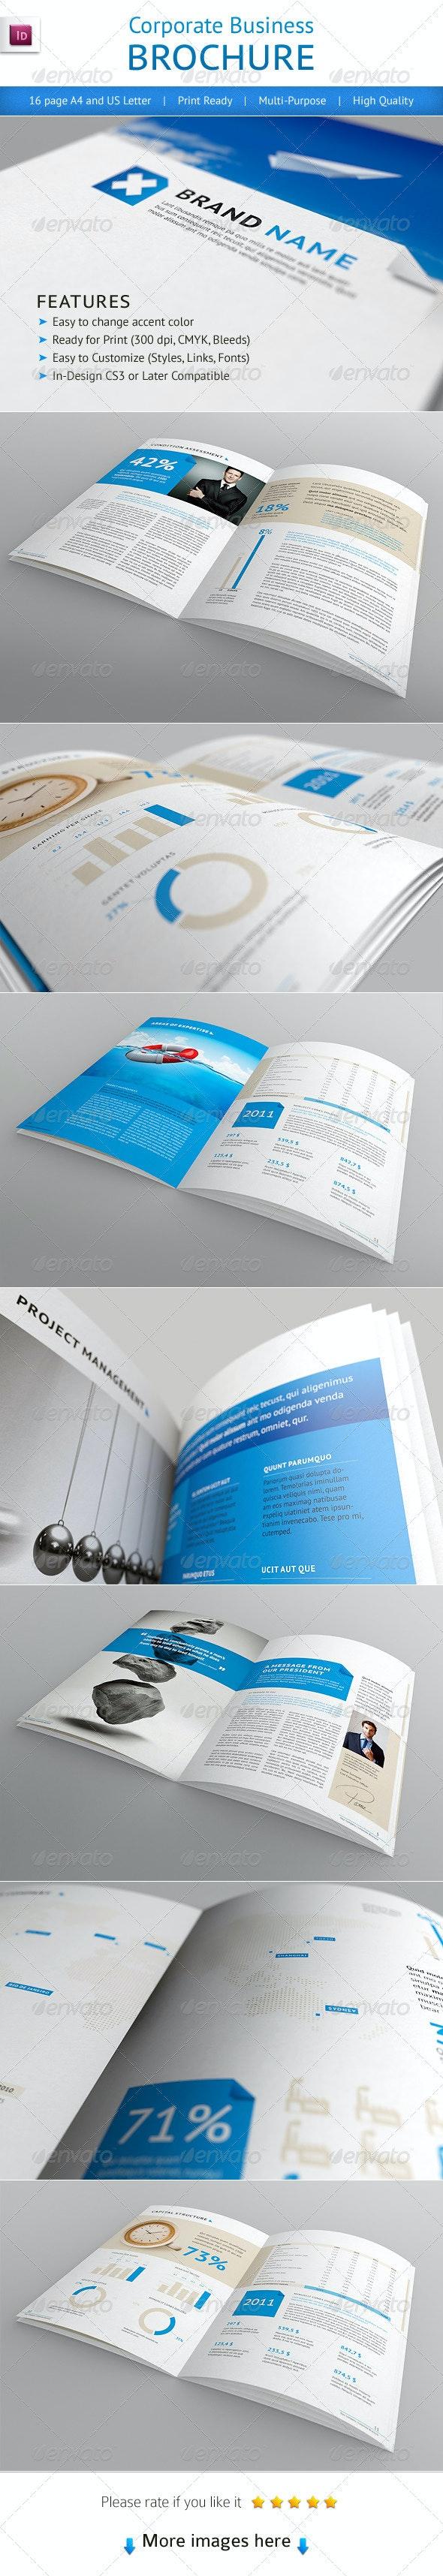 Professional Corporate Business Brochure - Corporate Brochures